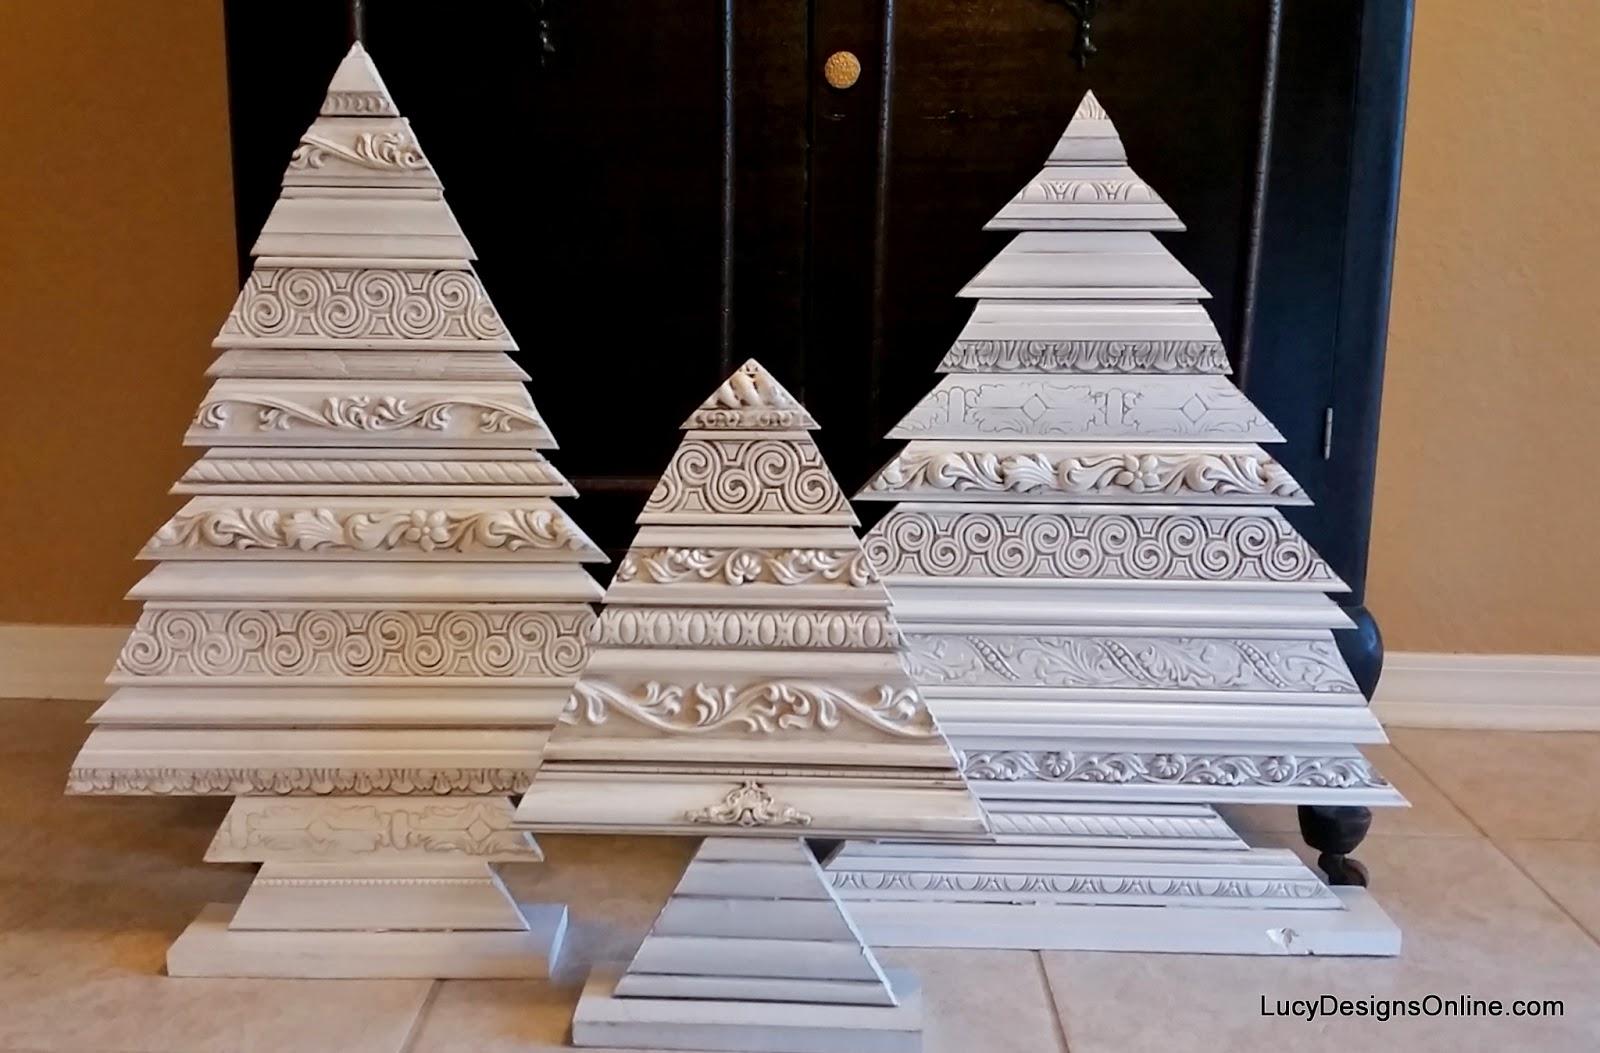 alternative christmas tree set, wood art tree sculptures using